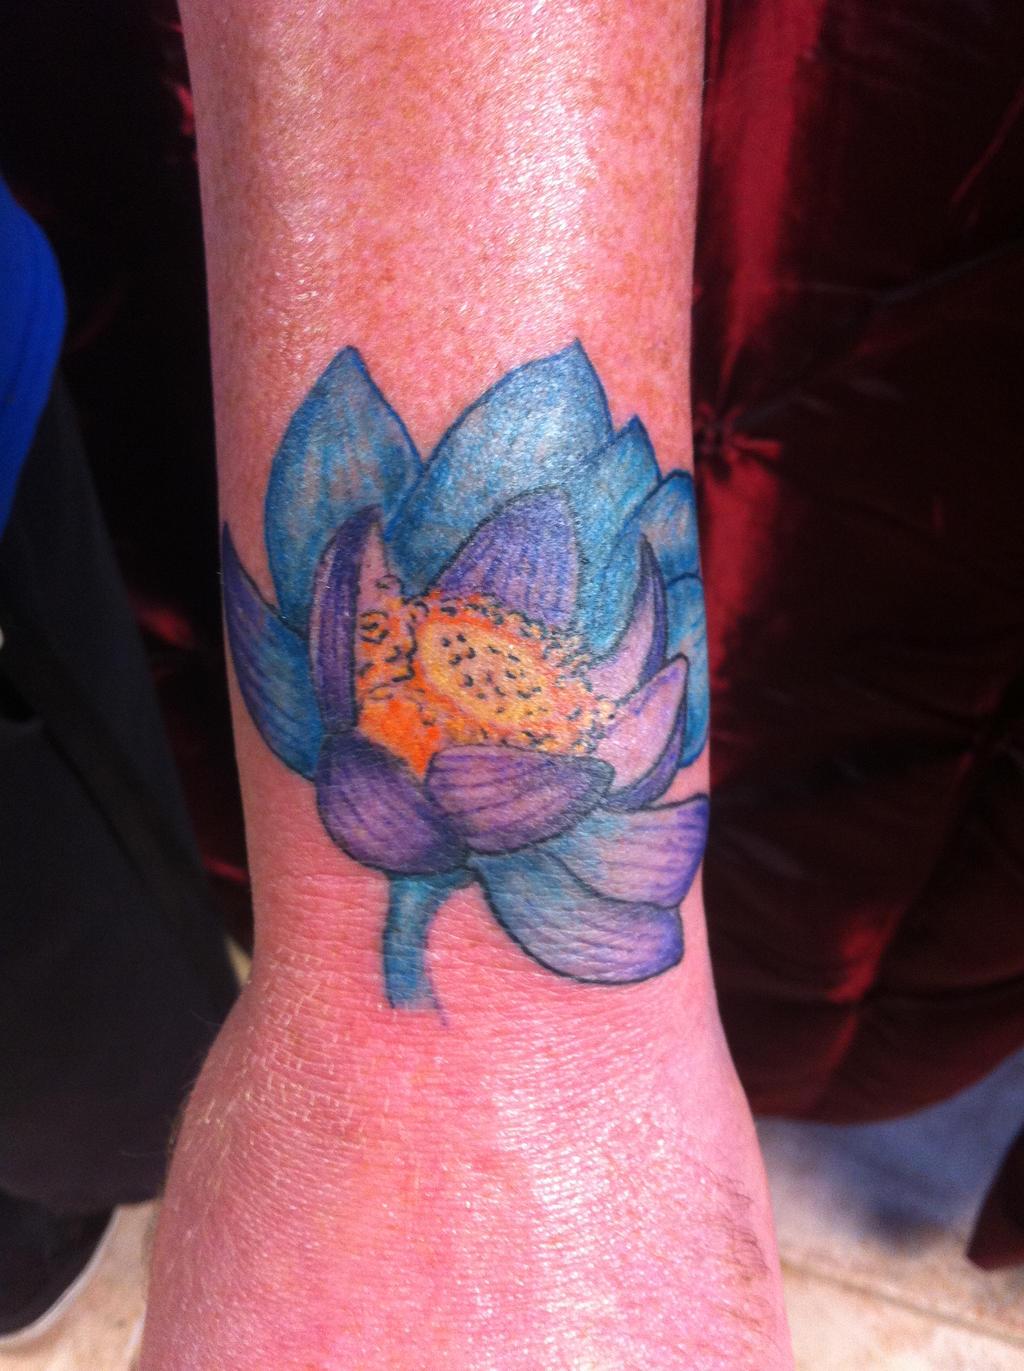 lotus bloom tattoo magic the gathering by mistryssc on deviantart. Black Bedroom Furniture Sets. Home Design Ideas